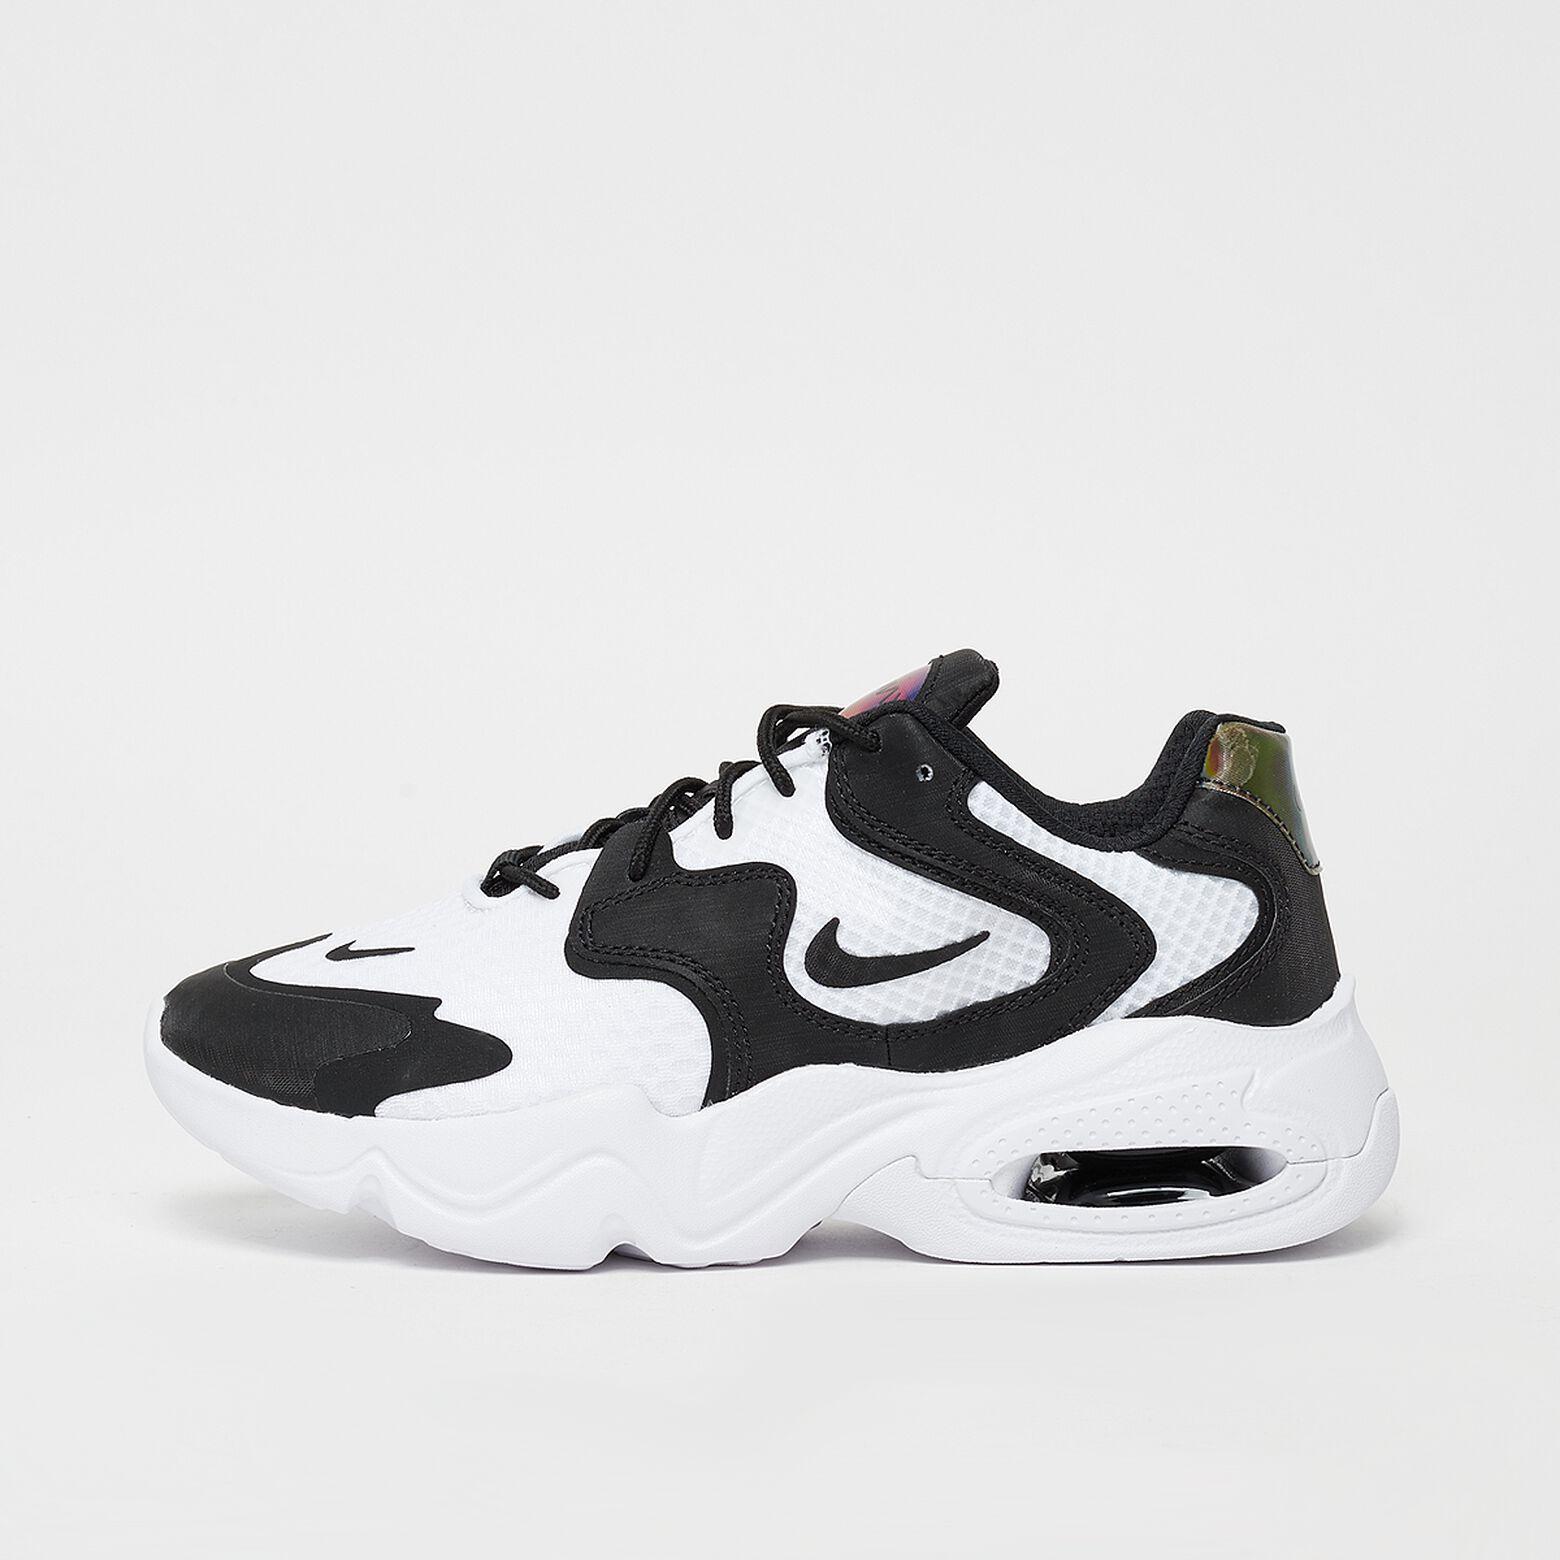 NIKE WMNS Air Max 2X Damen Sneaker für 52,99€ (statt 84€)